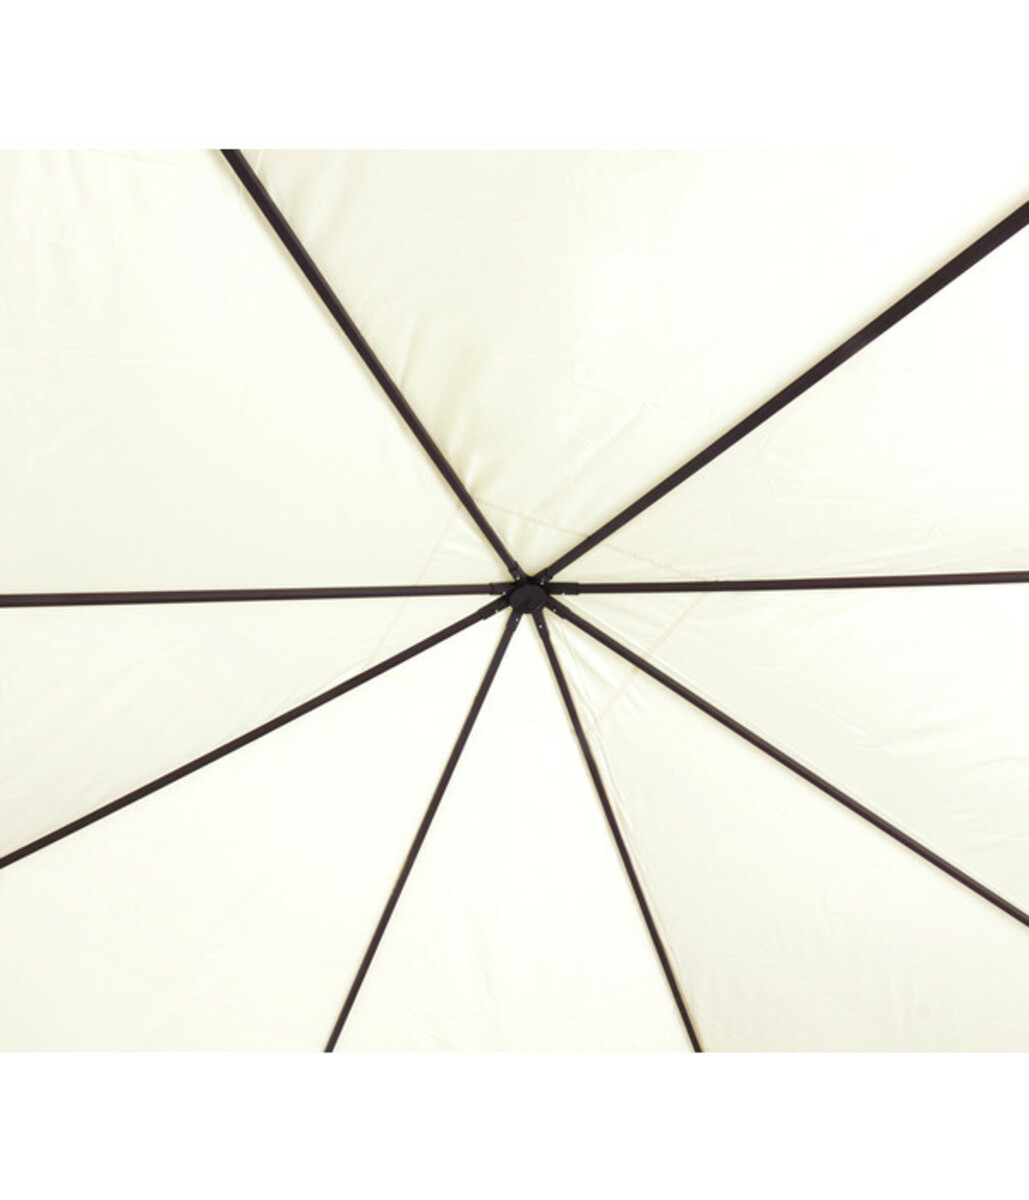 Bild 5 von tepro Gartenpavillon Kaemi, ca. 295 x 295 x 280 cm